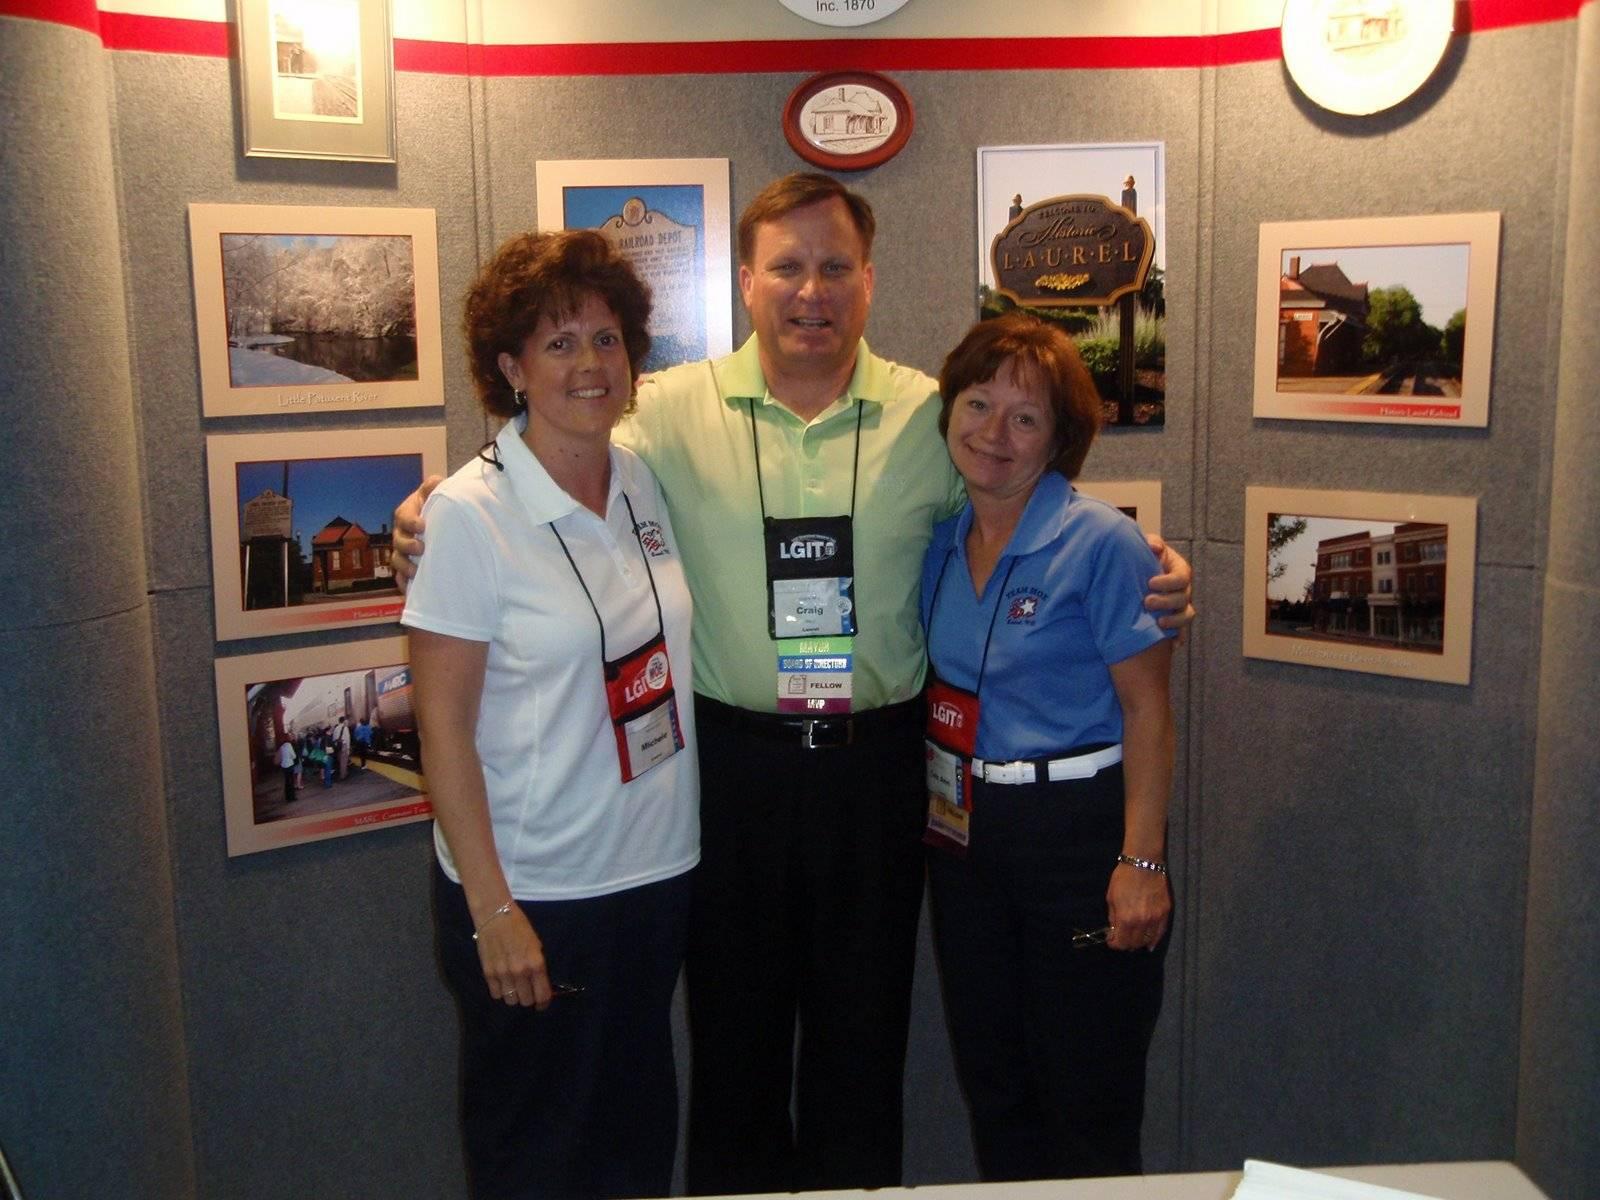 Maryland Municipal League Conference